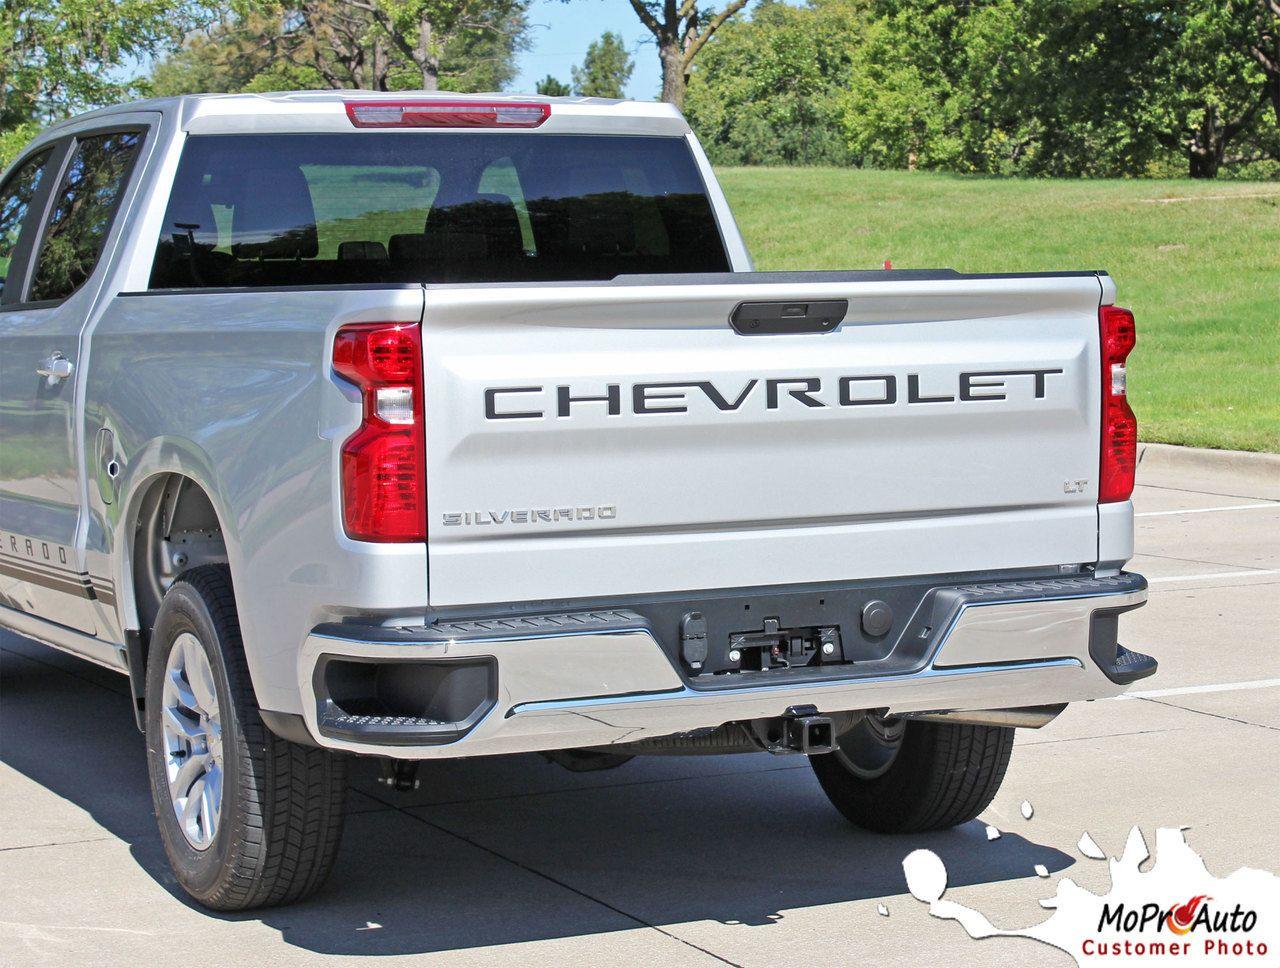 Ad Ebay 2007 2013 Chevy Silverado Gmc Sierra 1500 2500 Passenger Front Door Glass Oem In 2020 Chevy Silverado Chevy Silverado 1500 2013 Chevy Silverado